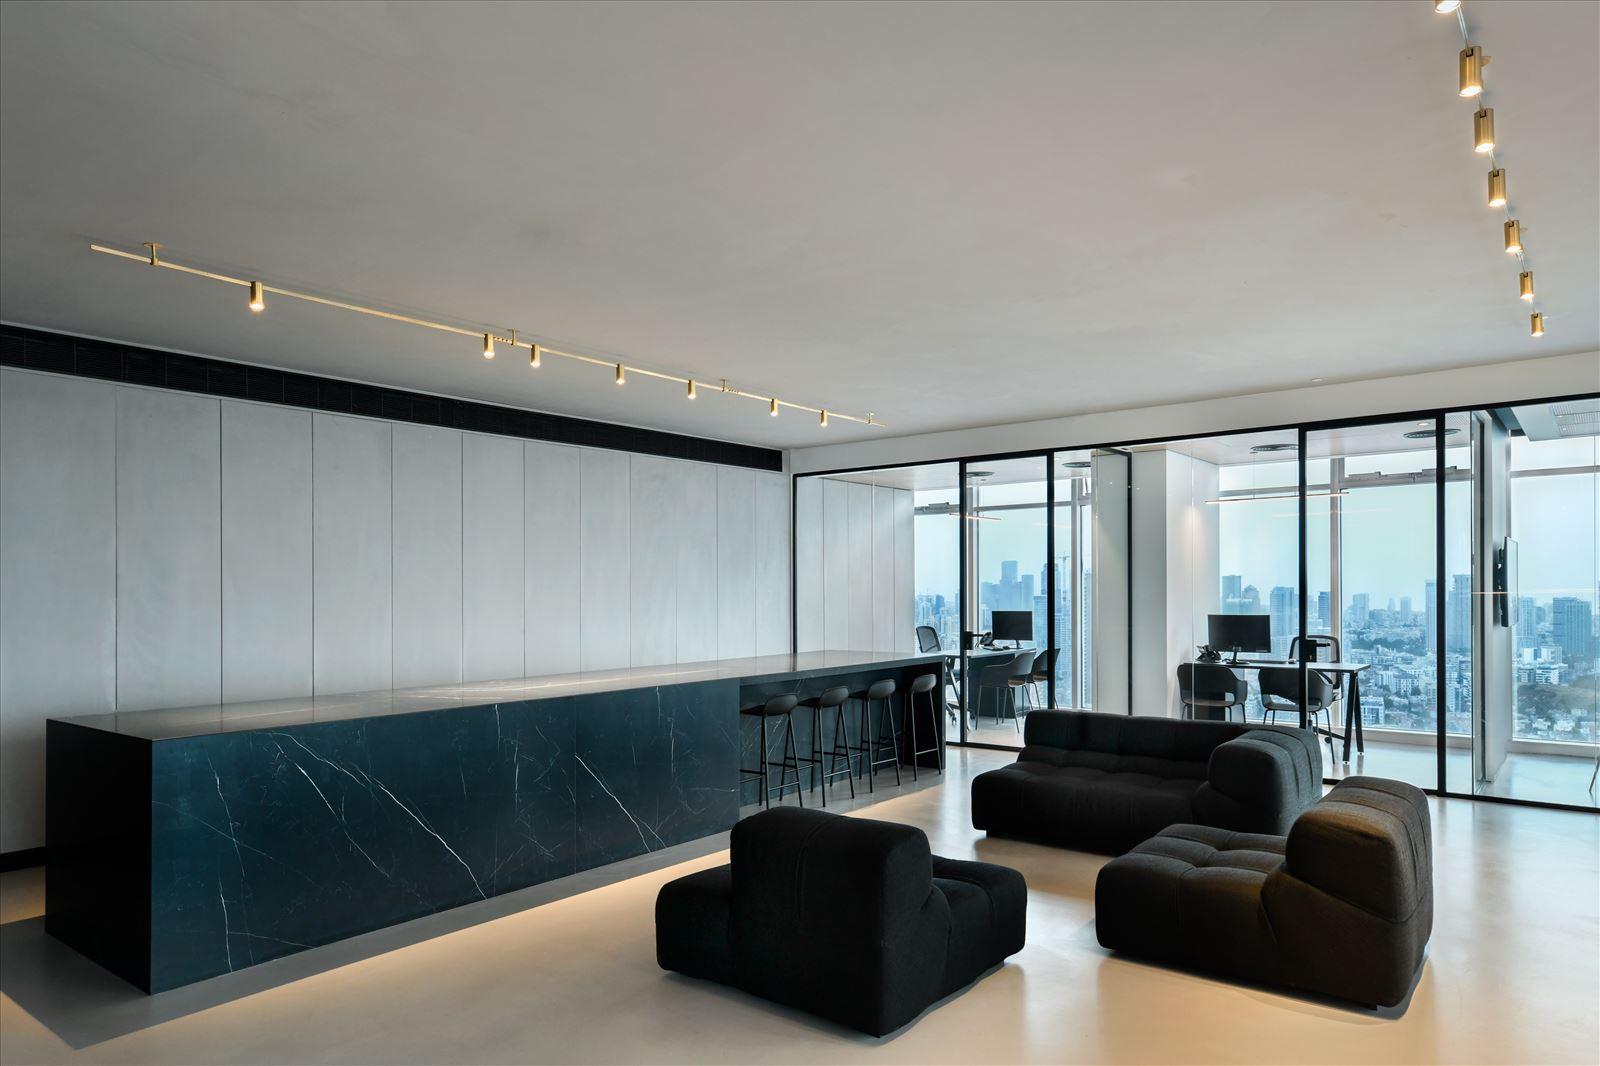 Divident office גופי תאורה מאירים את פינת הישיבה בתכנון קמחי תאורה